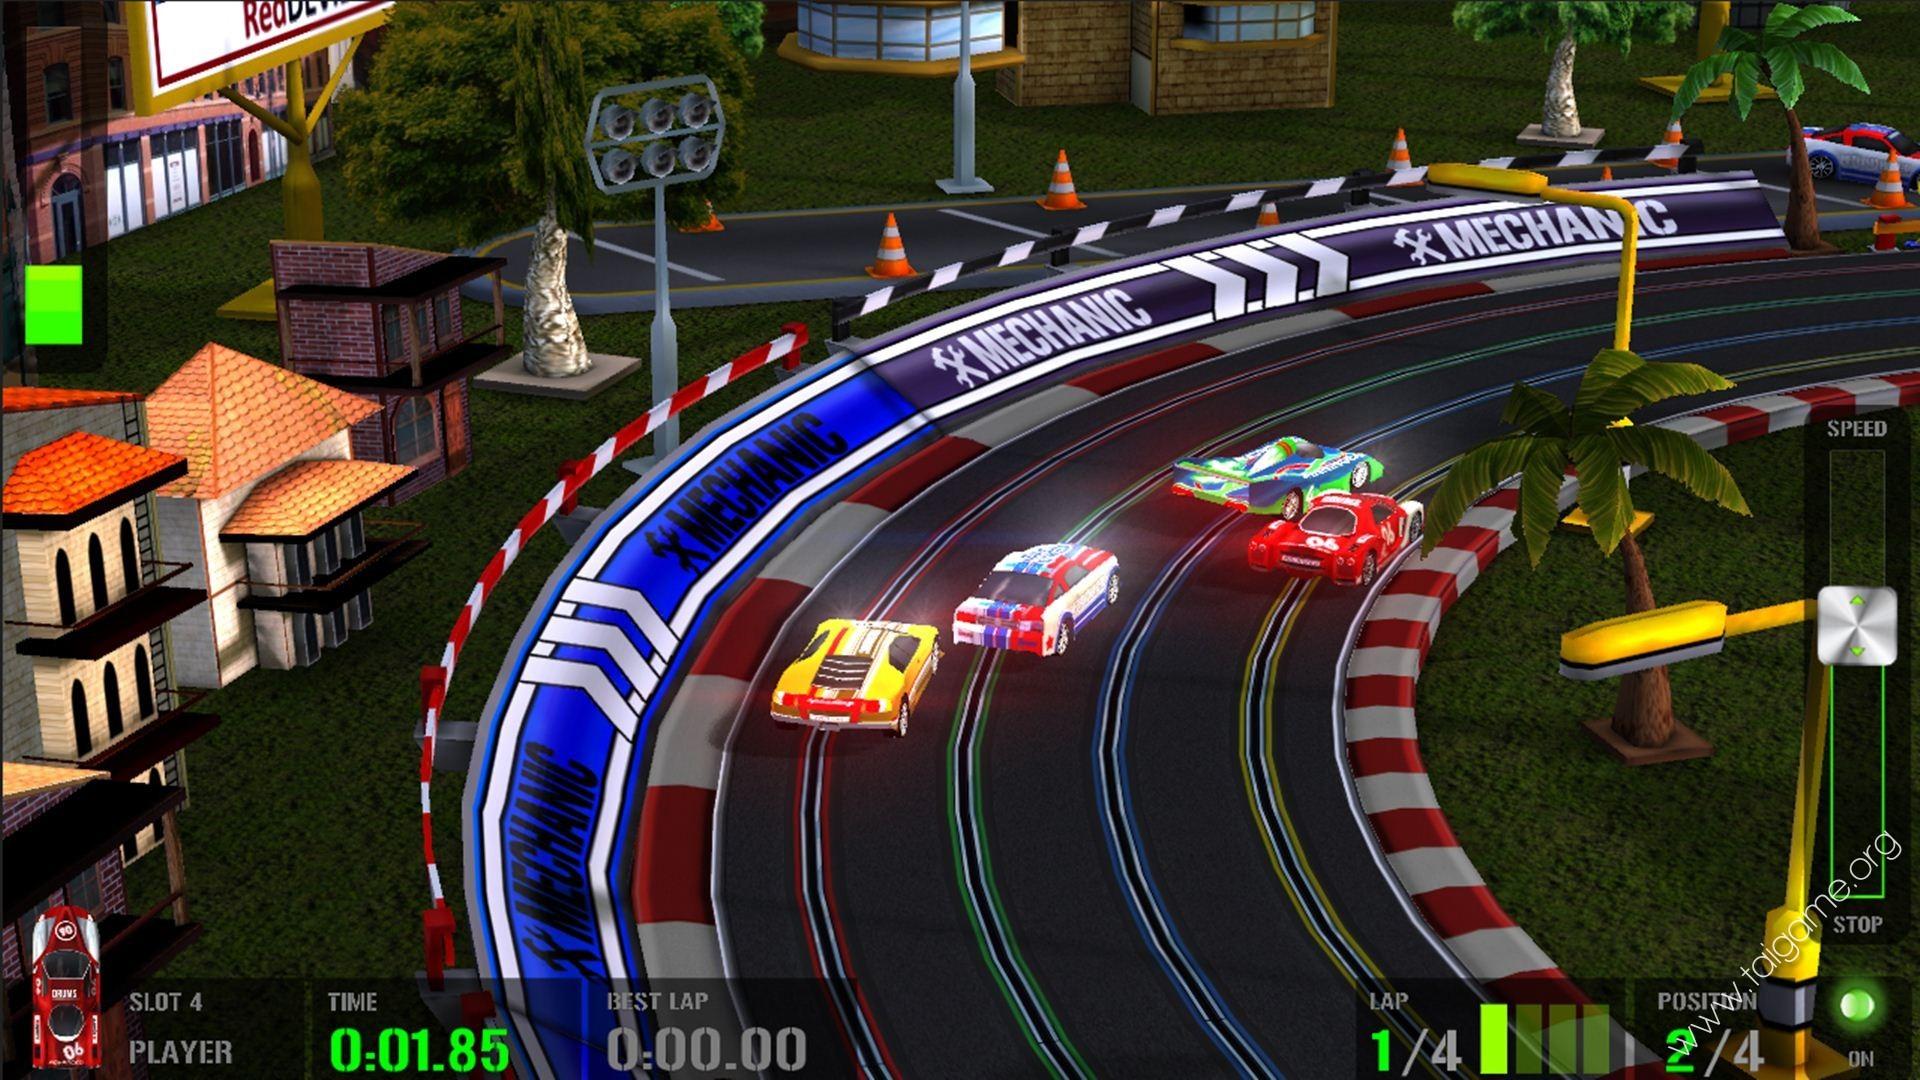 Htr Slot Car Simulation Download Free Full Games